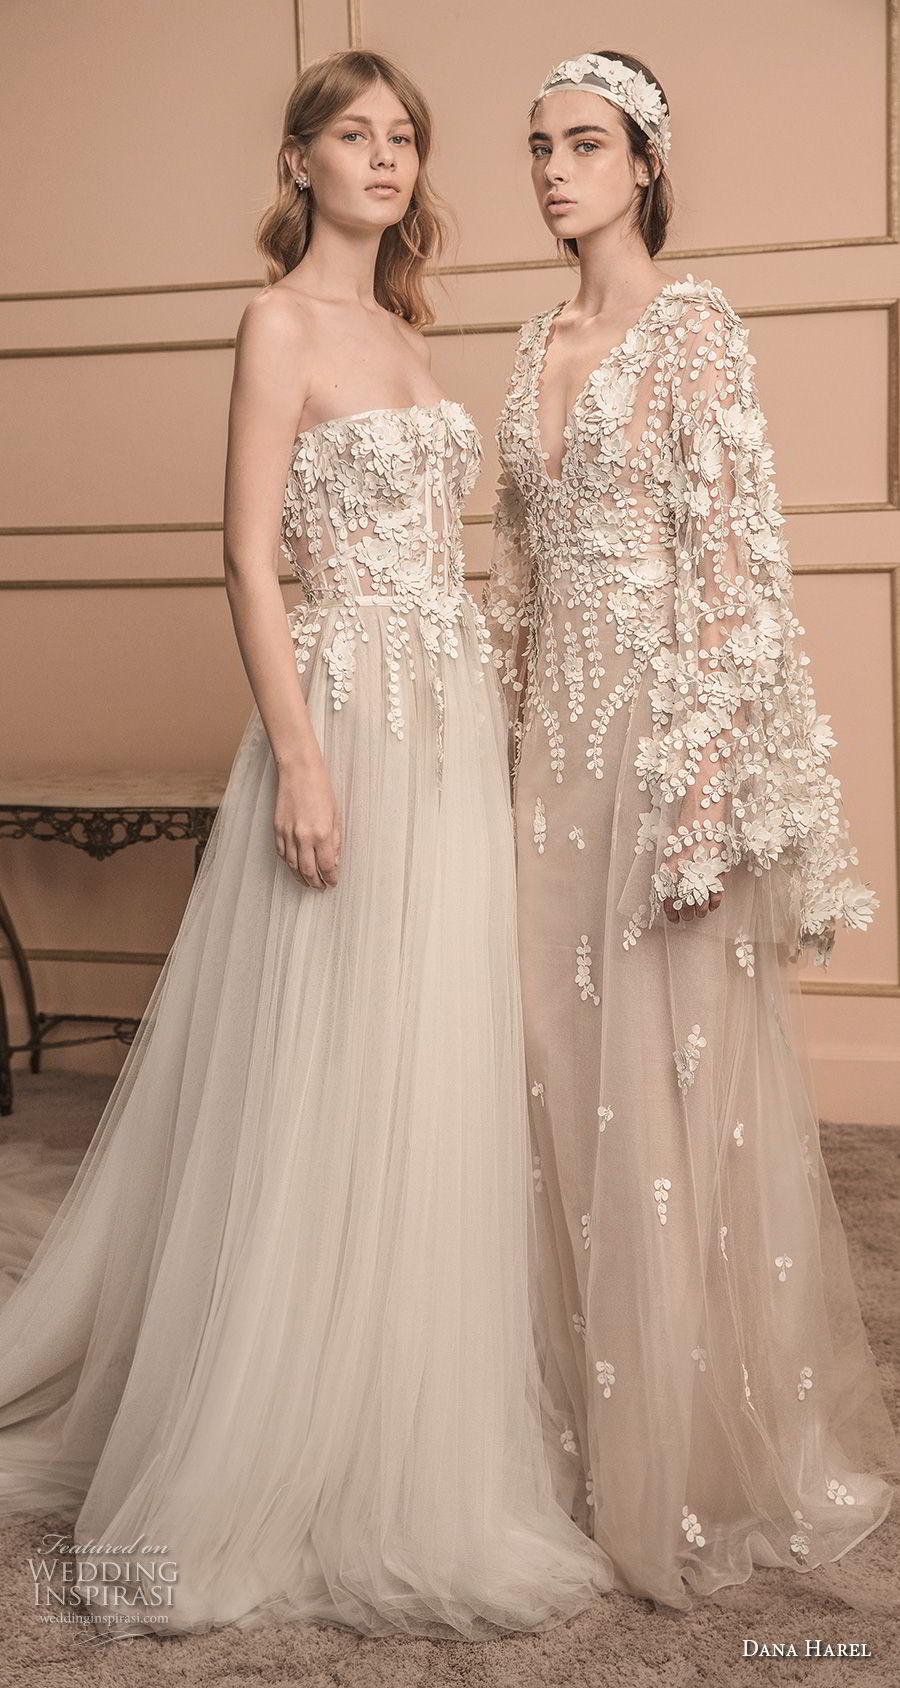 dana harel 2018 bridal romantic wedding gowns 1